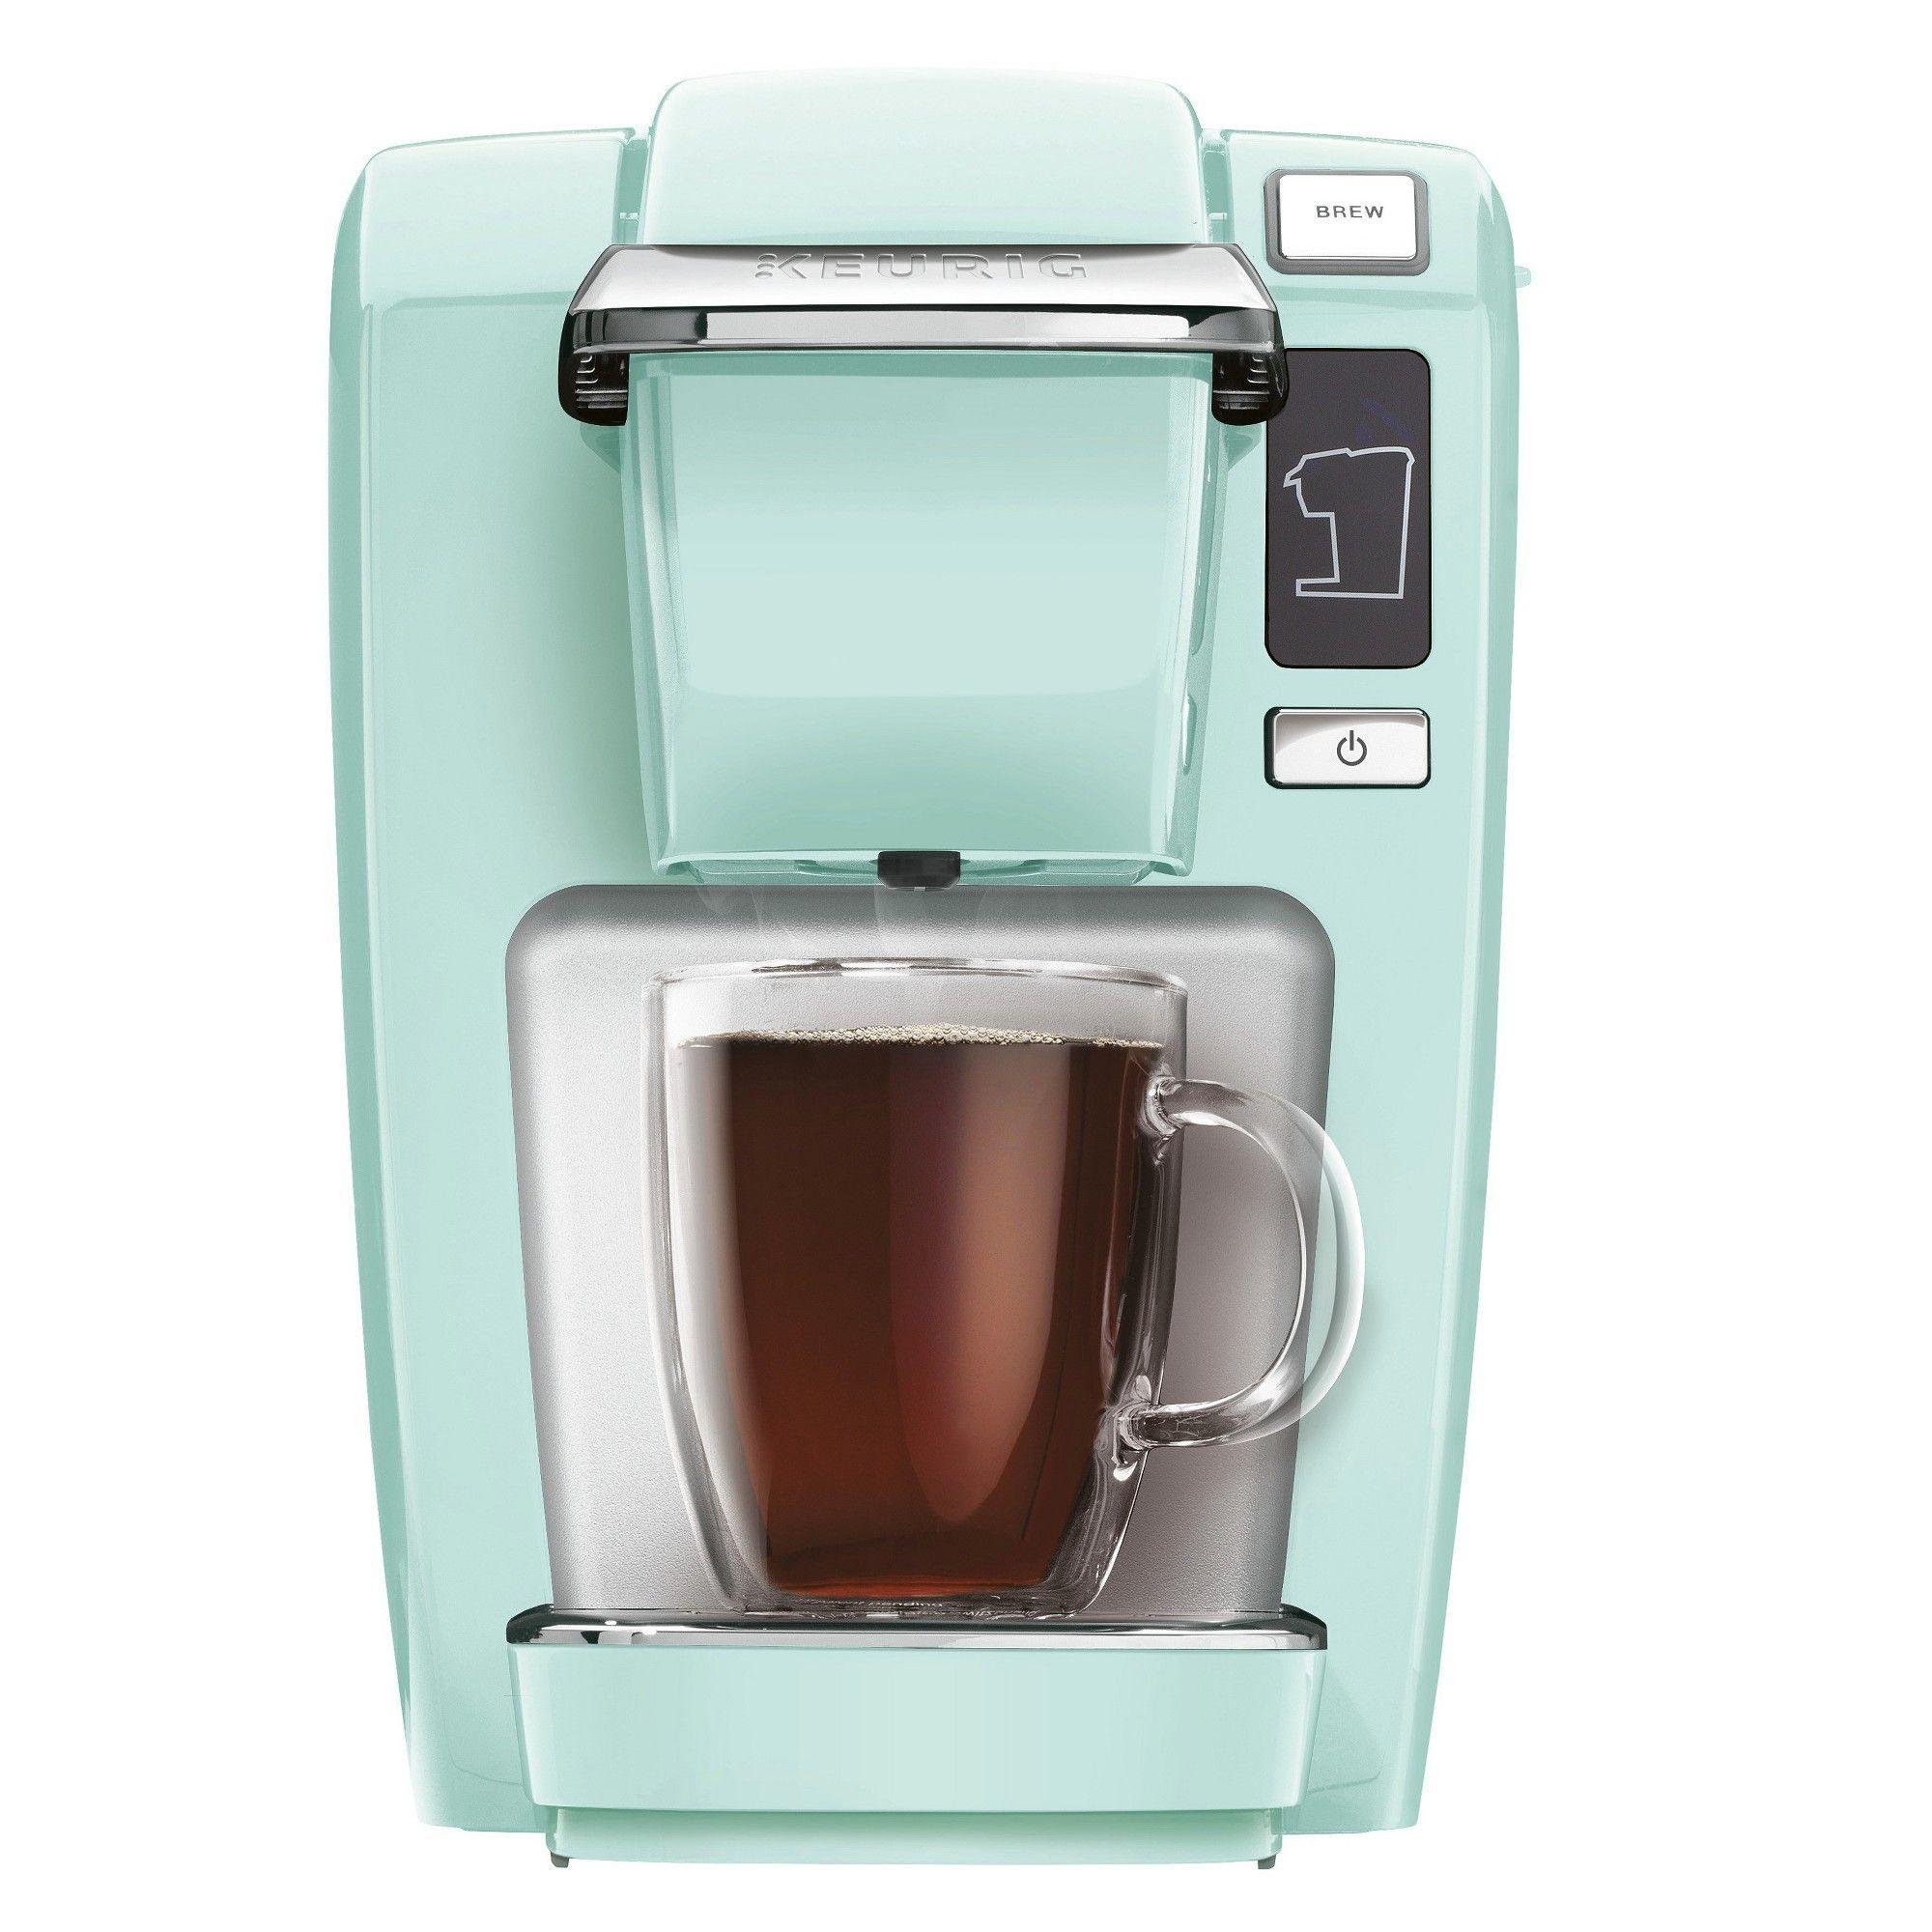 Keurig Plus Brewing System Oasis Green (K15) Pod coffee